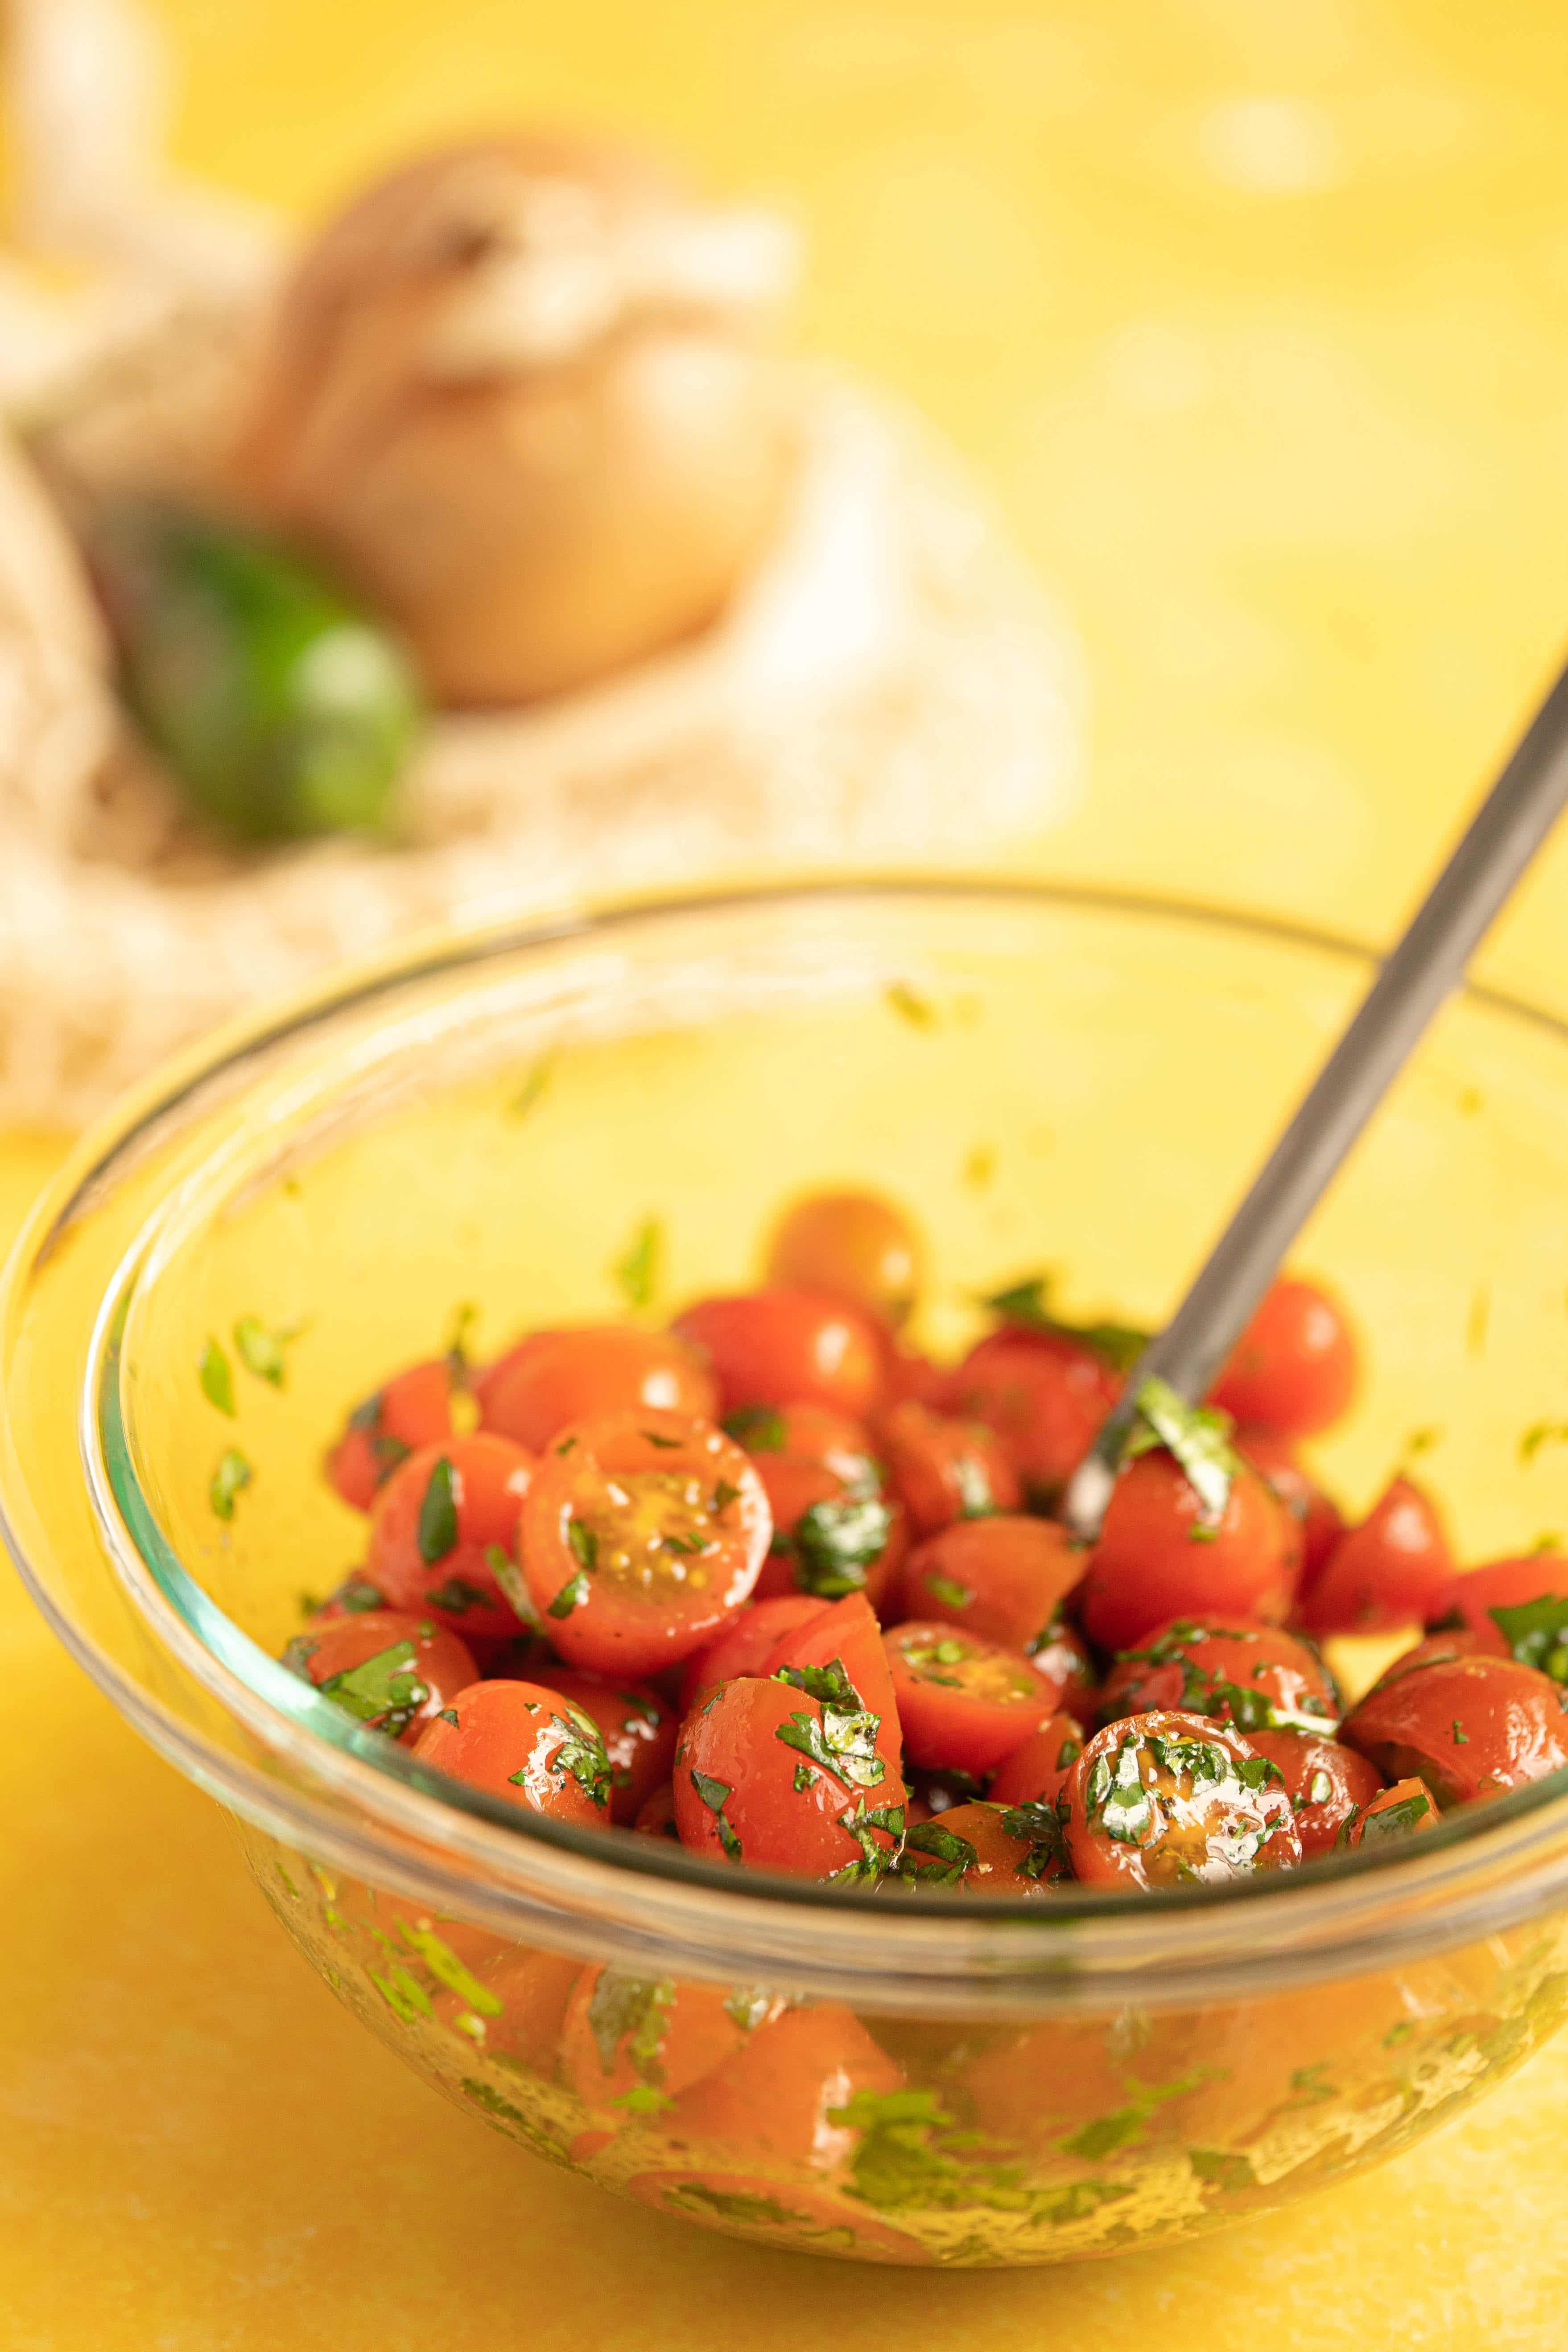 A bowl of tomato salad